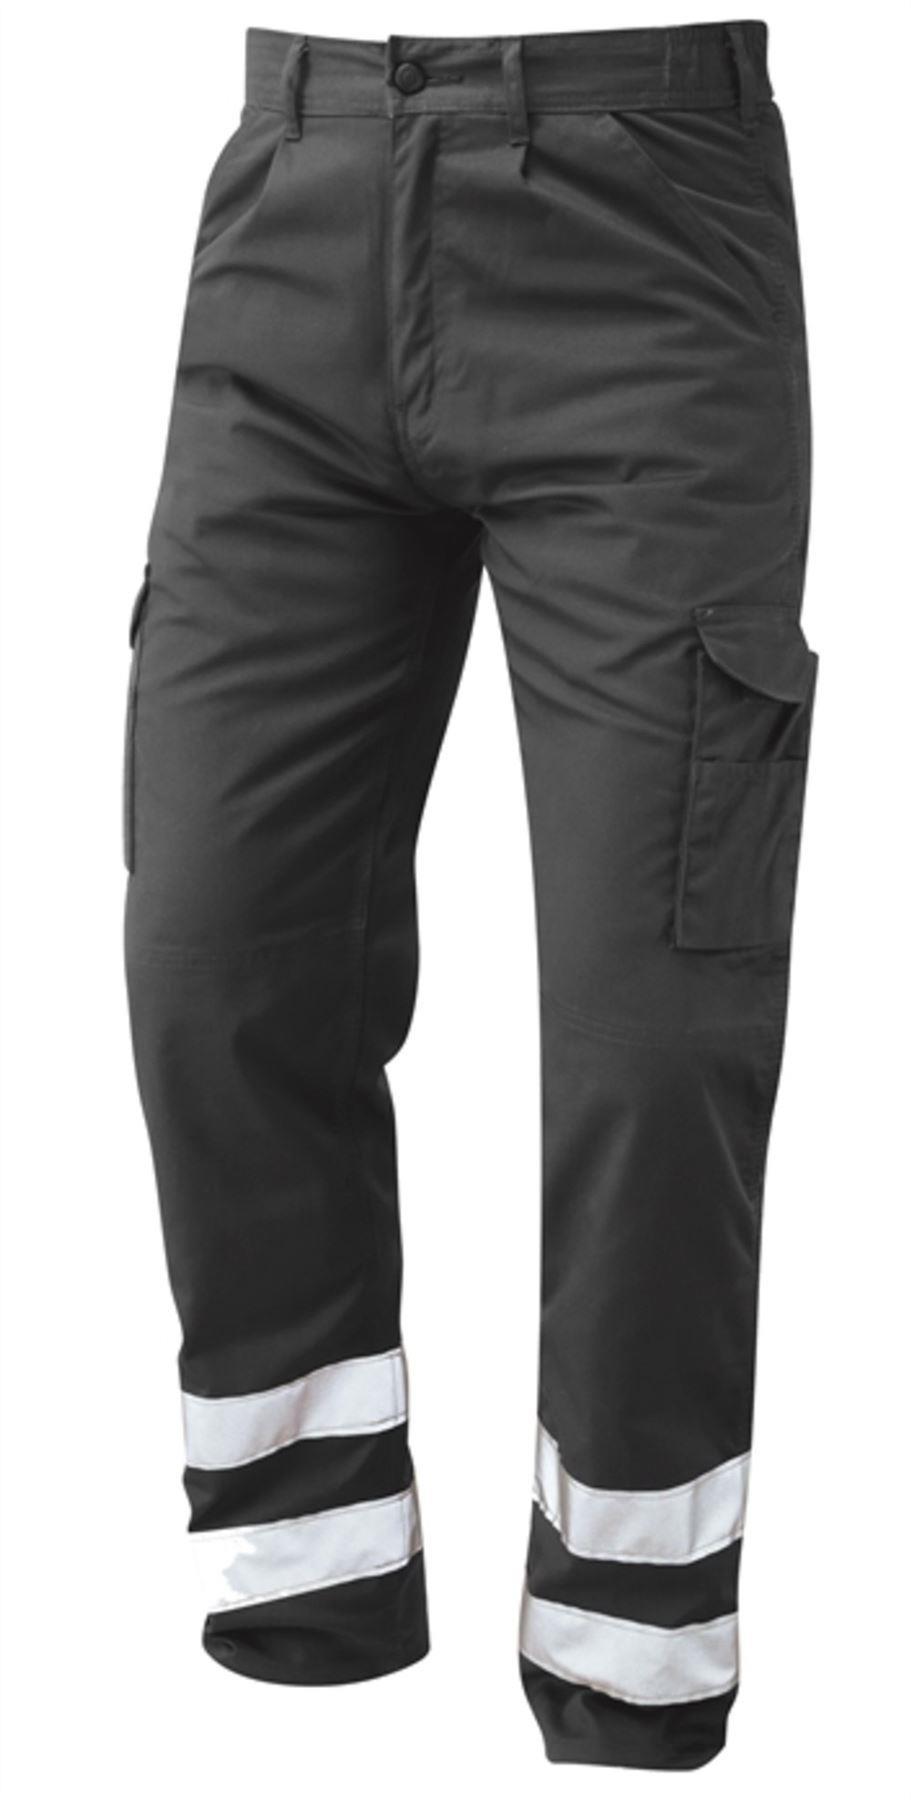 Orn Condor Hi Vis Kneepad Trousers - Graphite Grey|42W35L